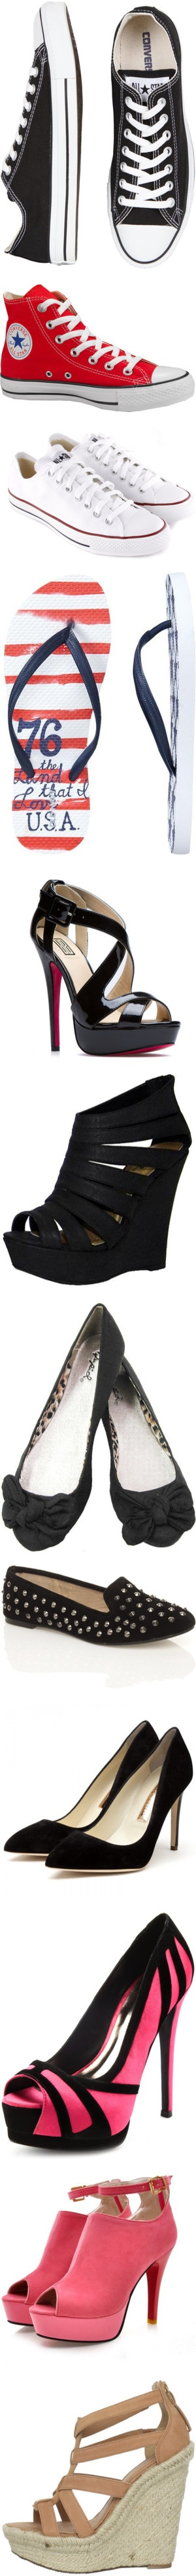 """shoes"" by kashika-ragoonanan on Polyvore"